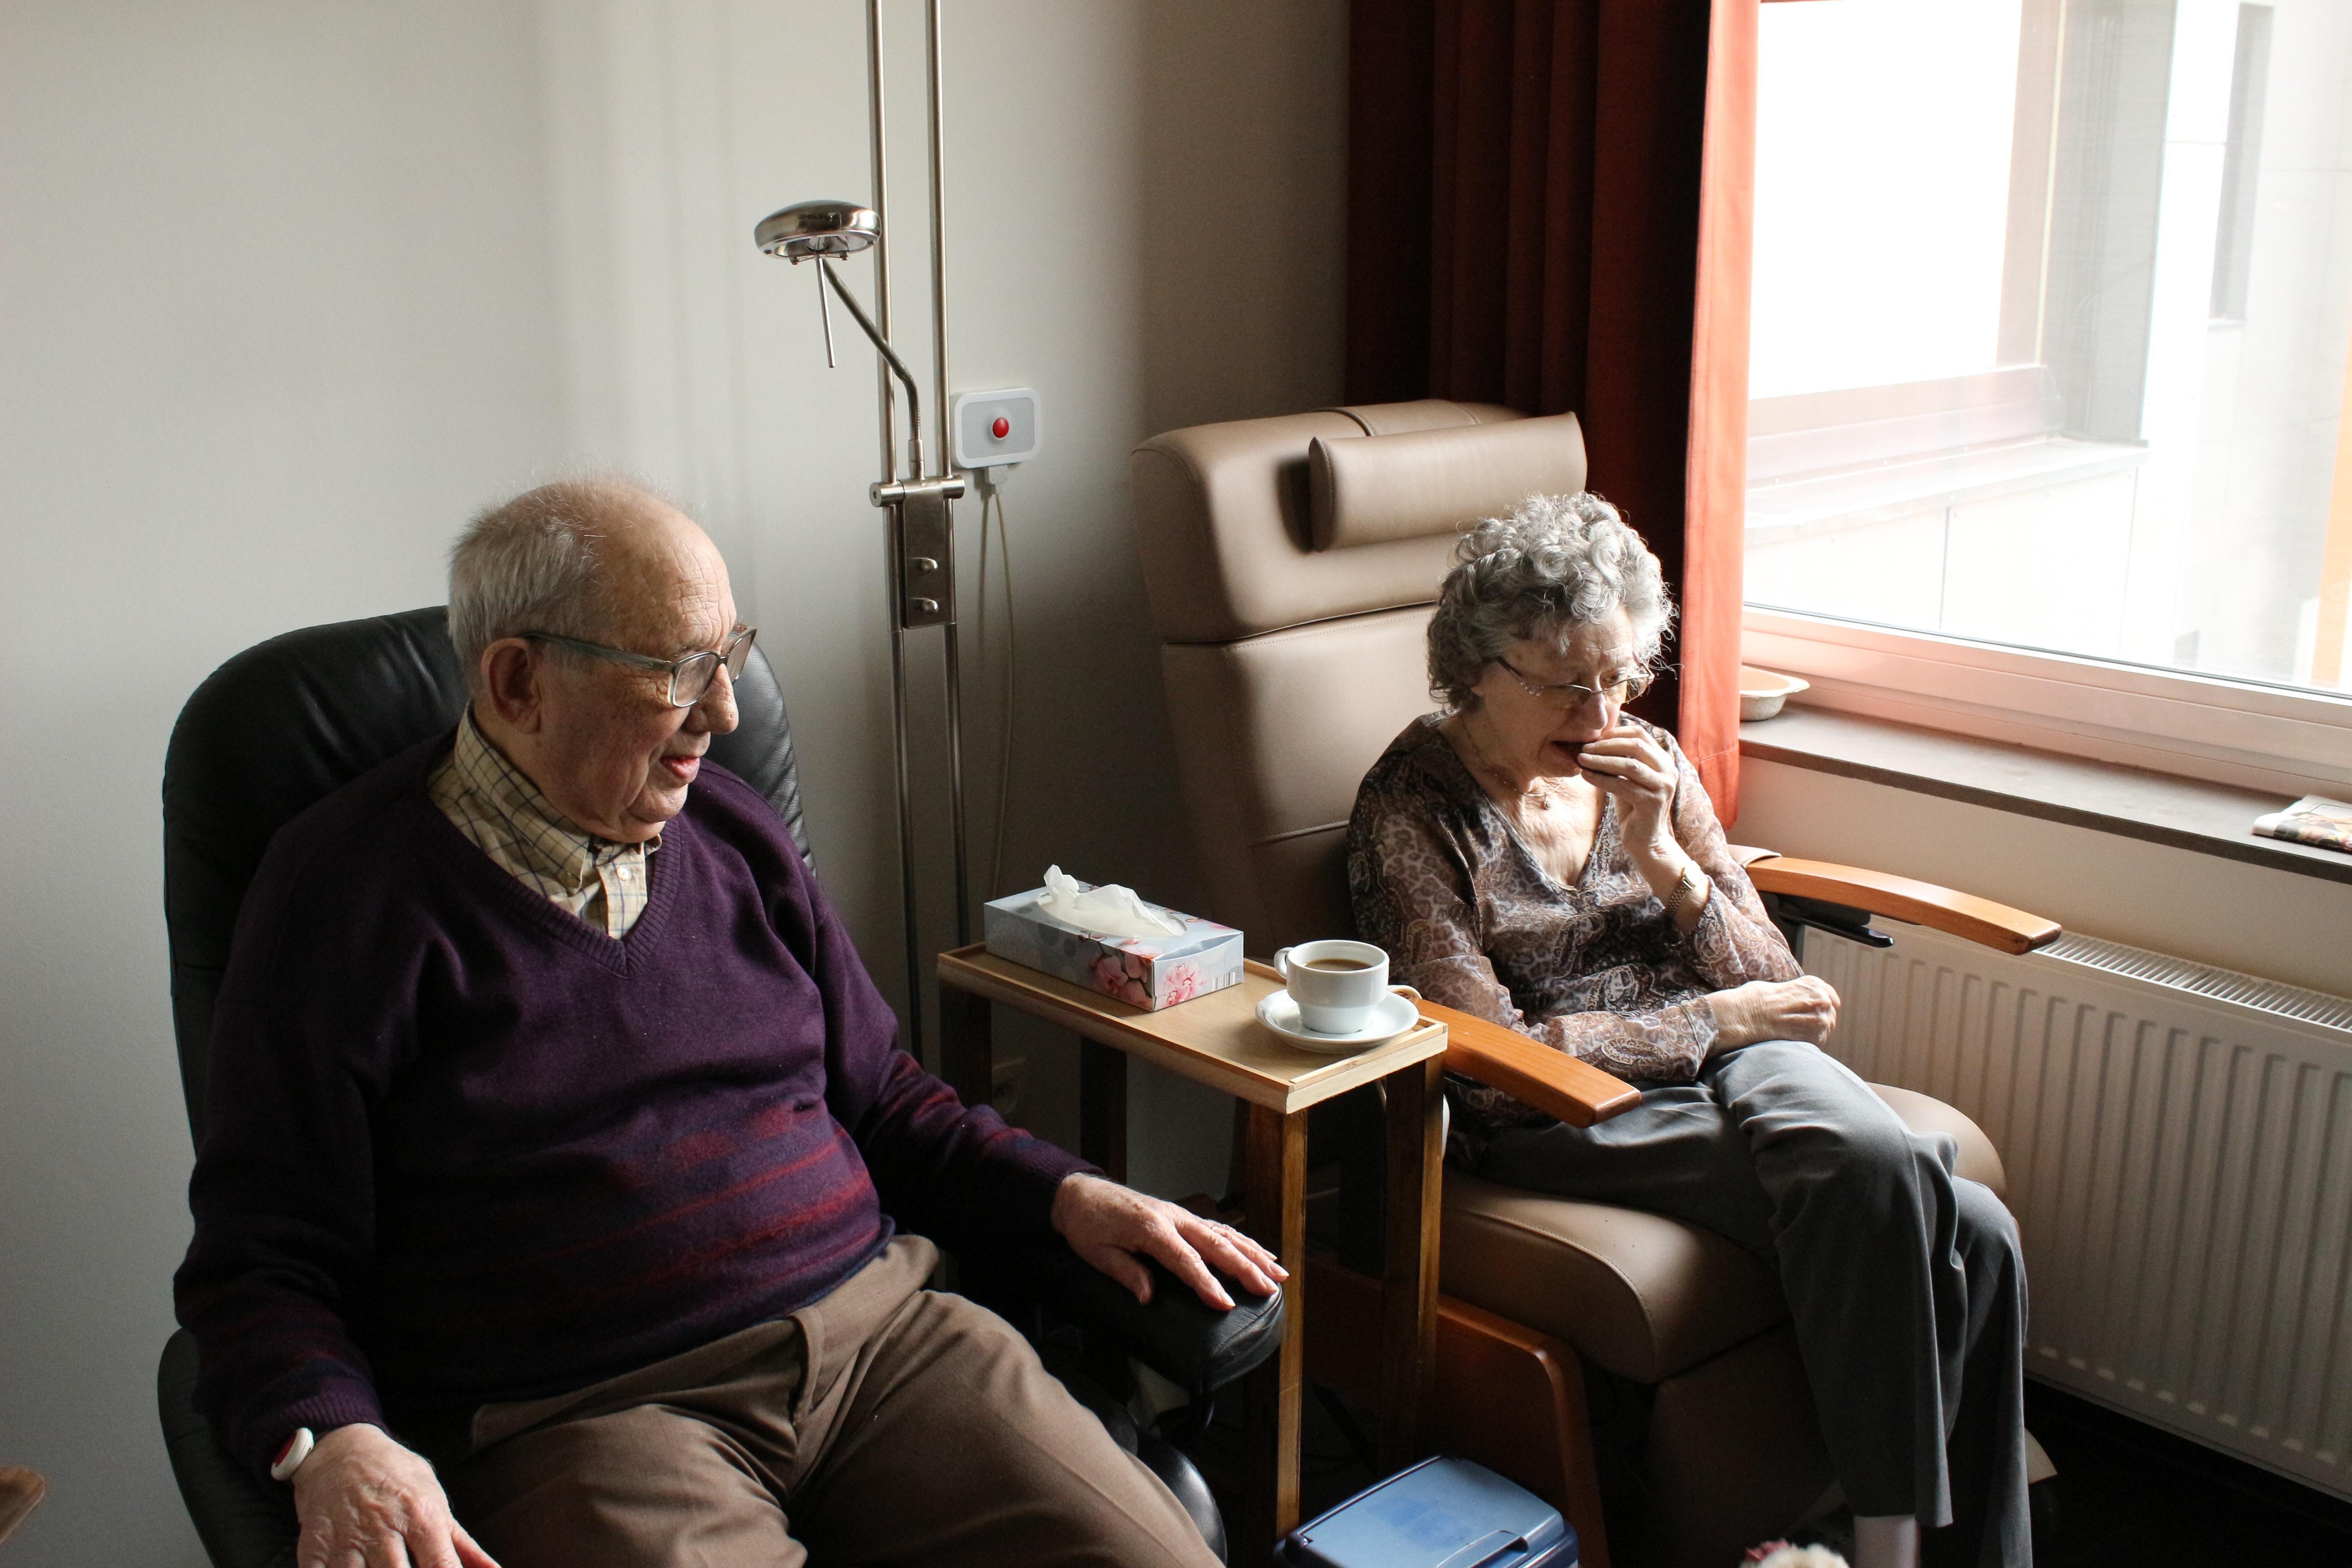 couple sitting side by side near panel radiator